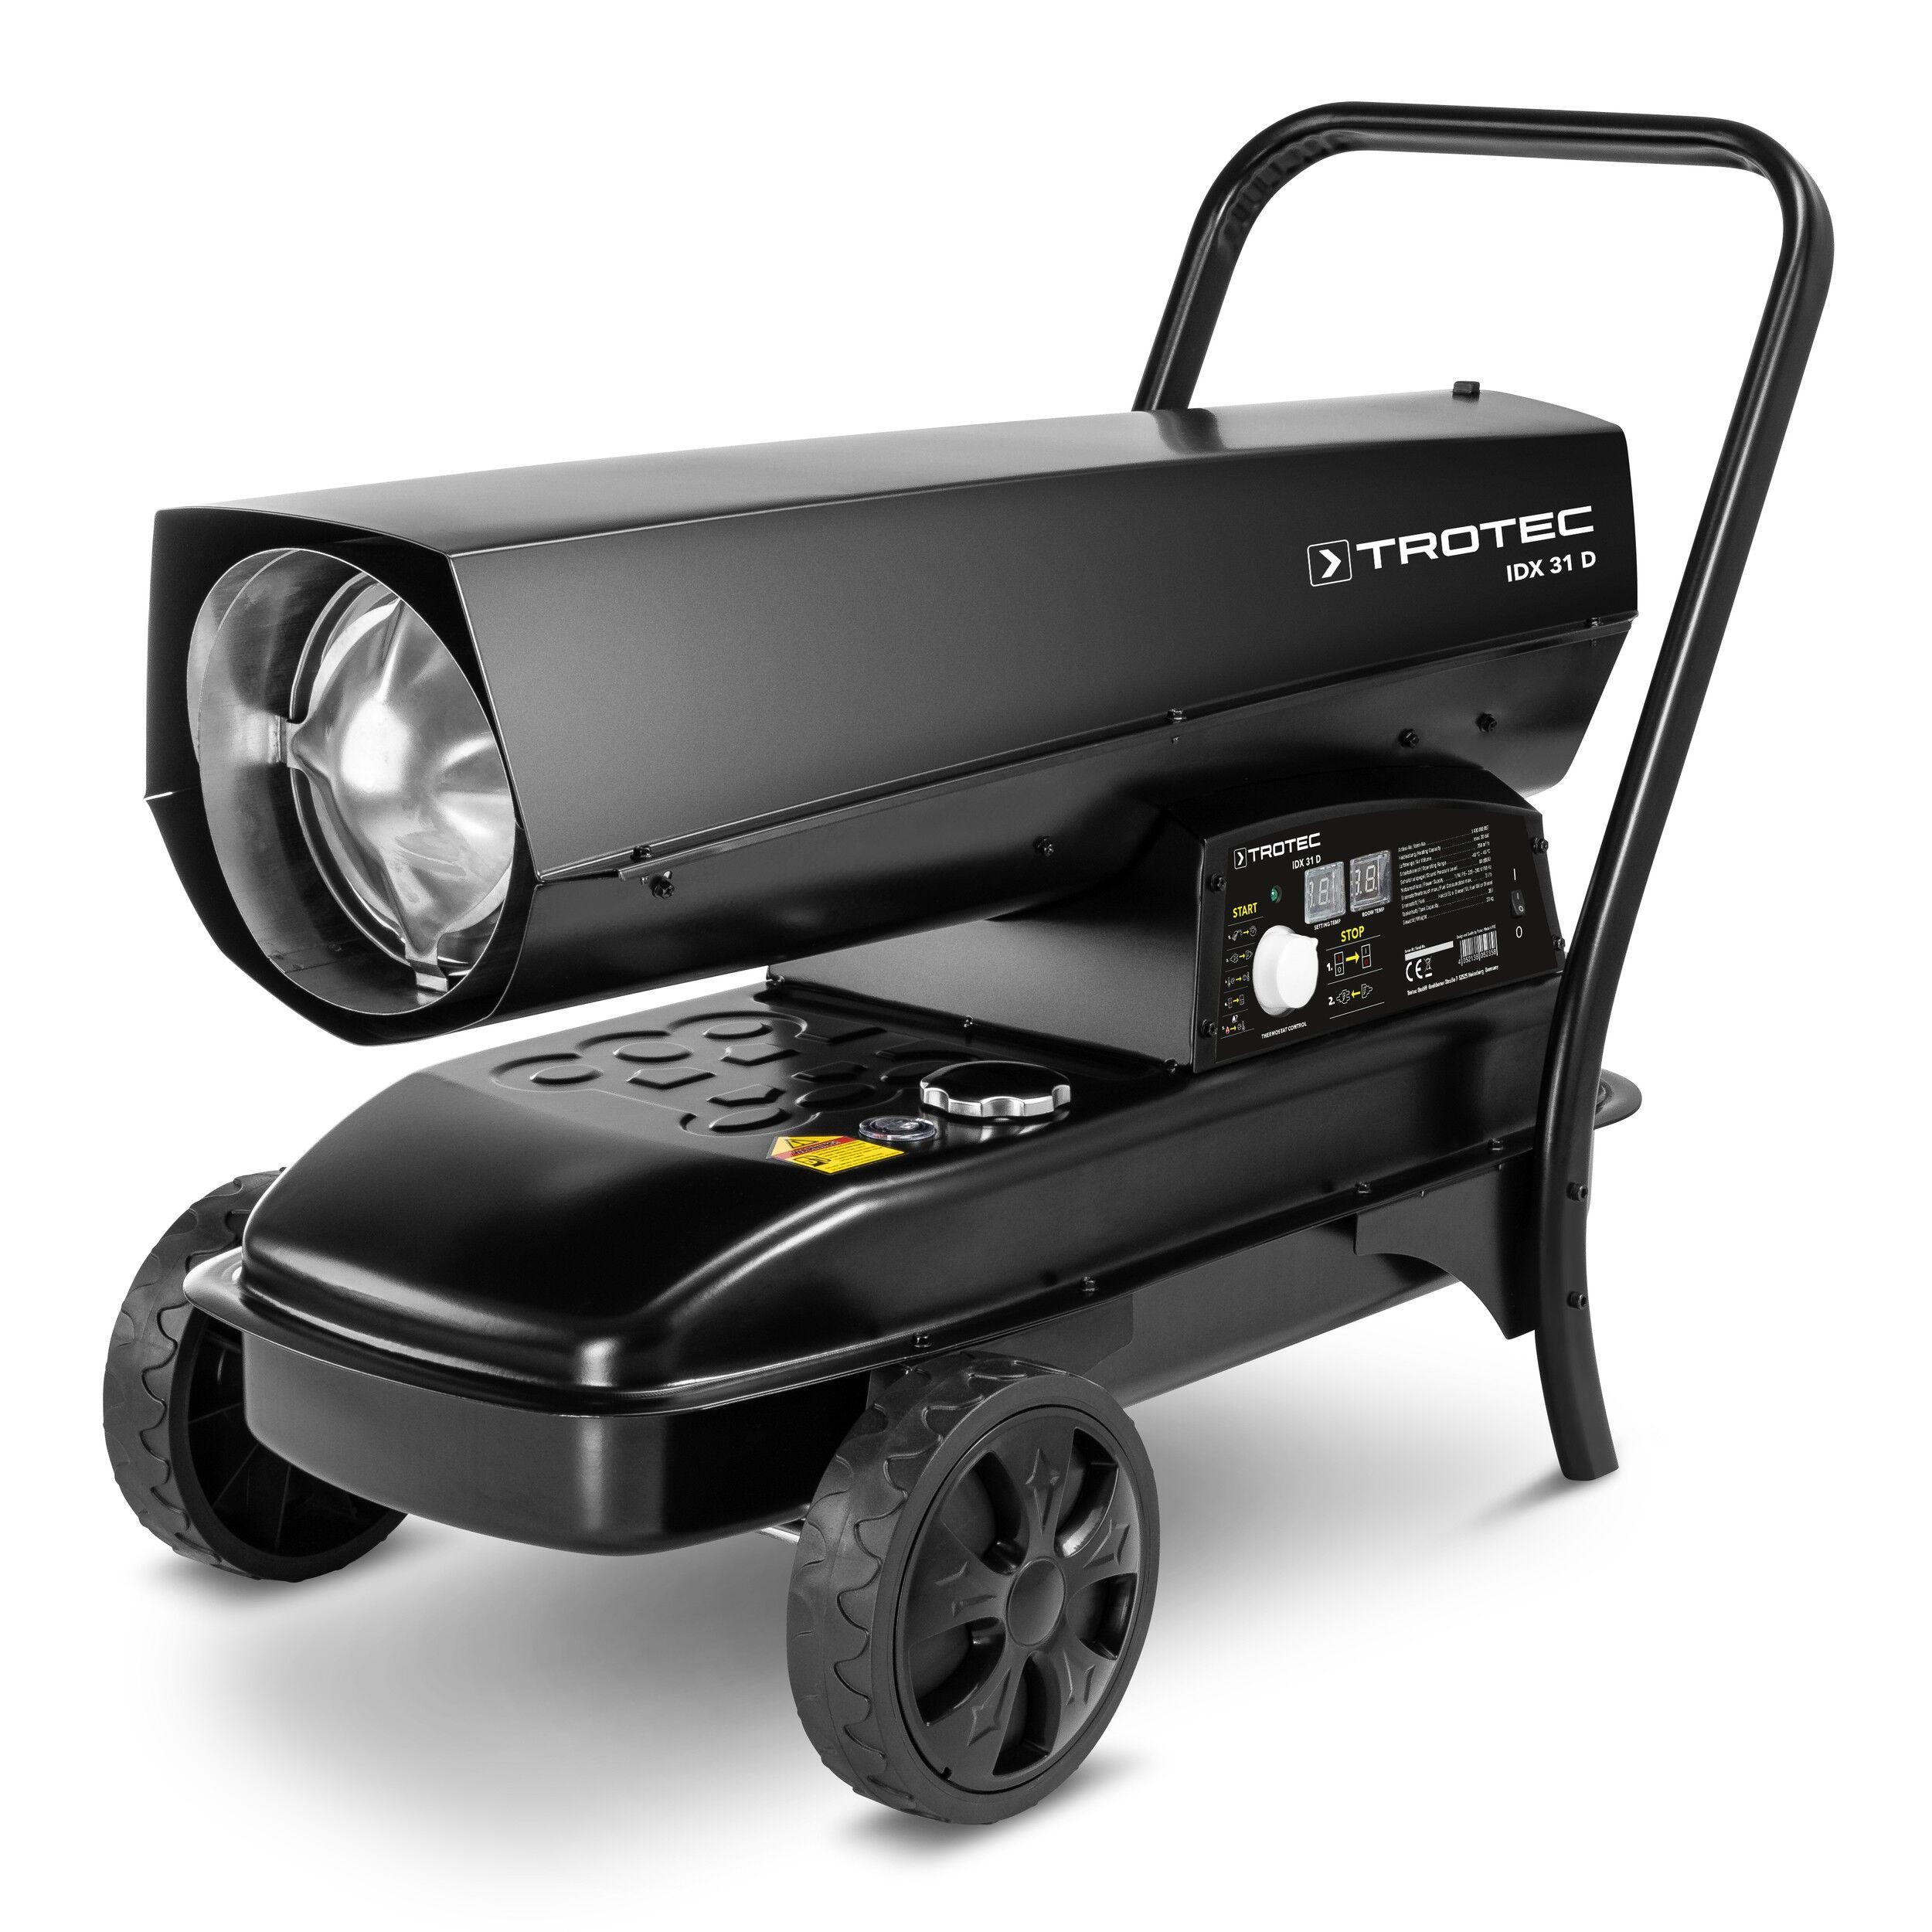 trotec generatore d'aria calda a gasolio diretto idx 31 d